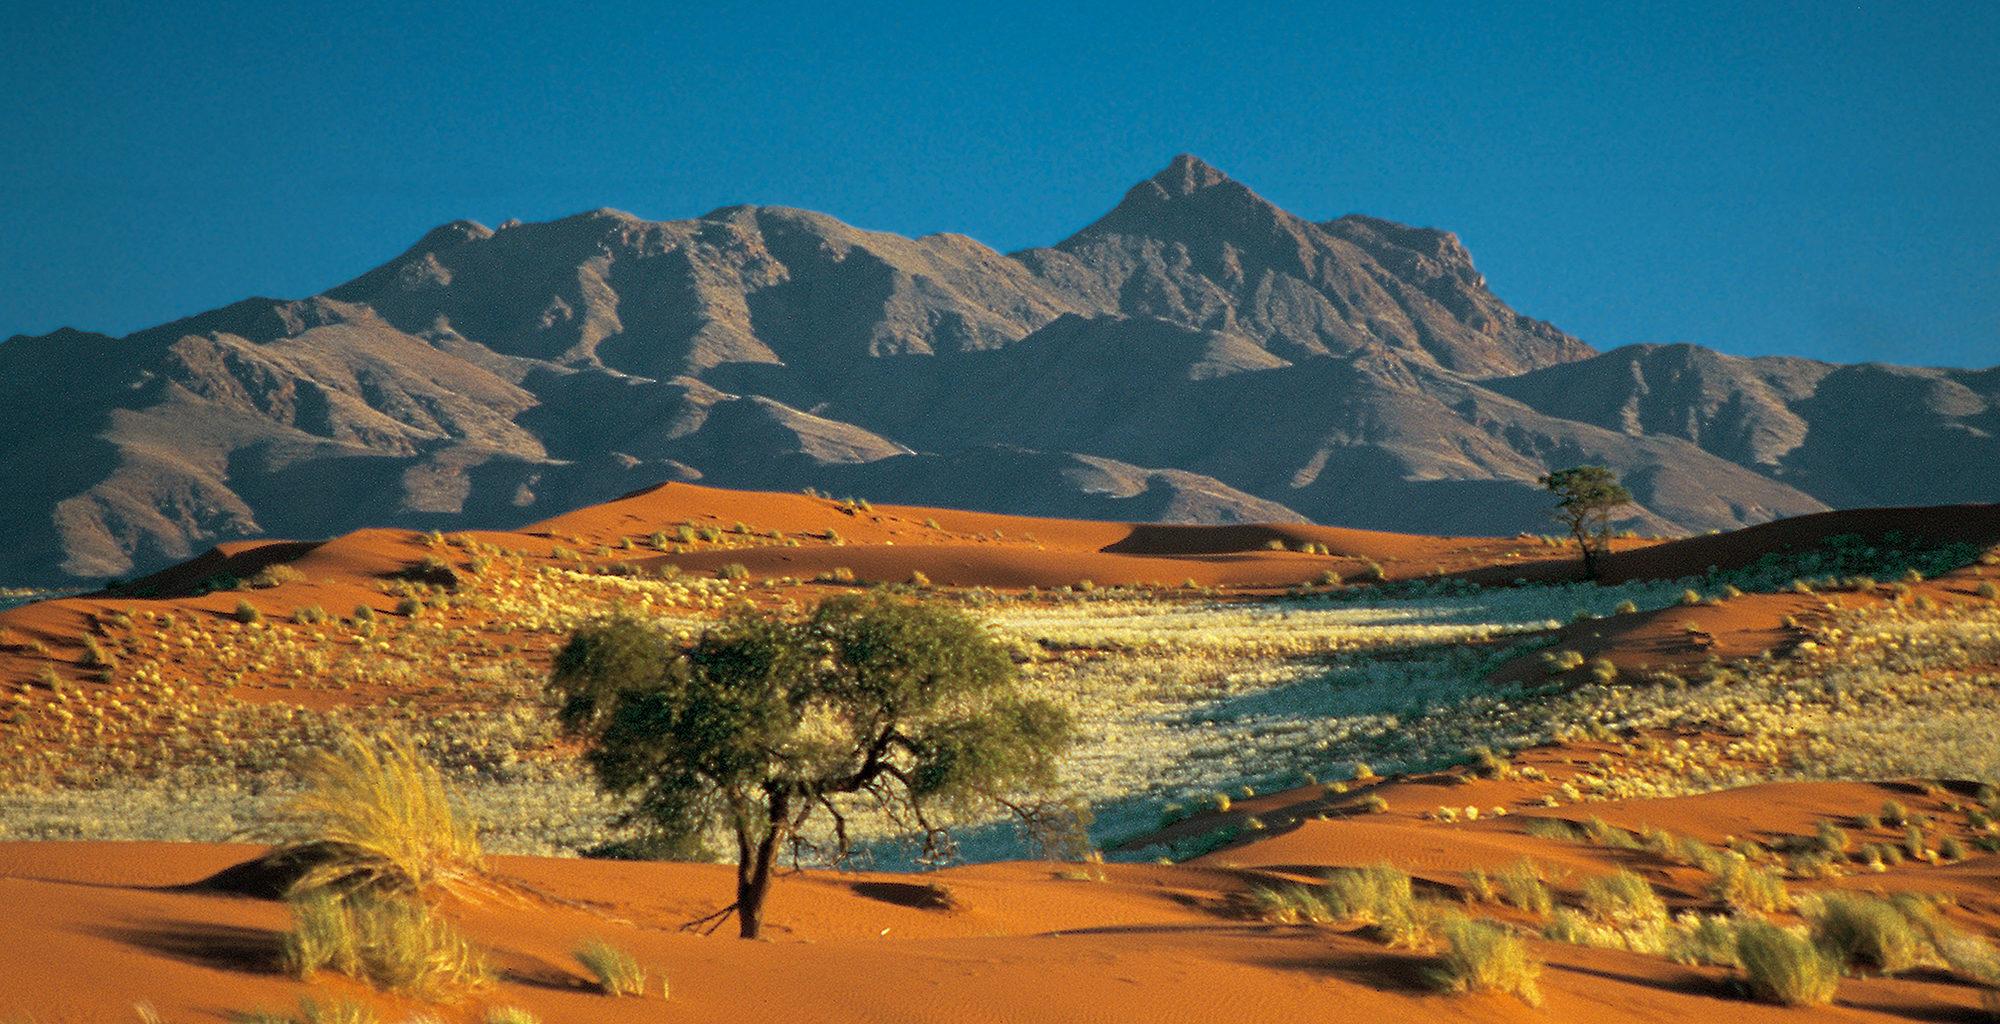 Namibia-NamibRand-Reserve-Landscape-Mountain